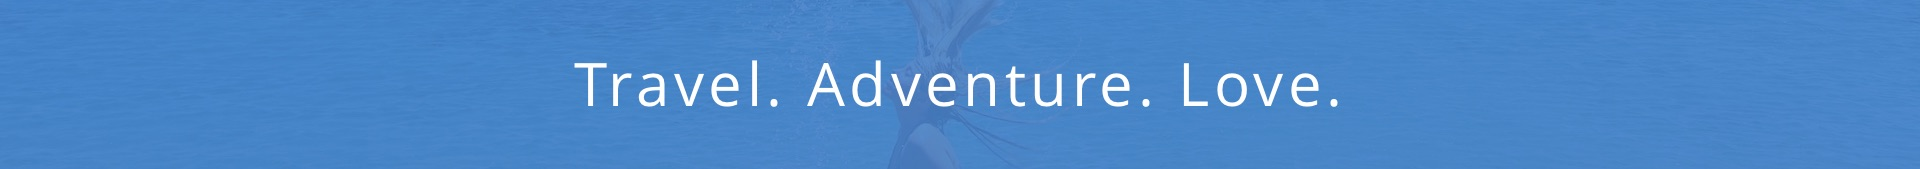 Travel-Adventure-Love